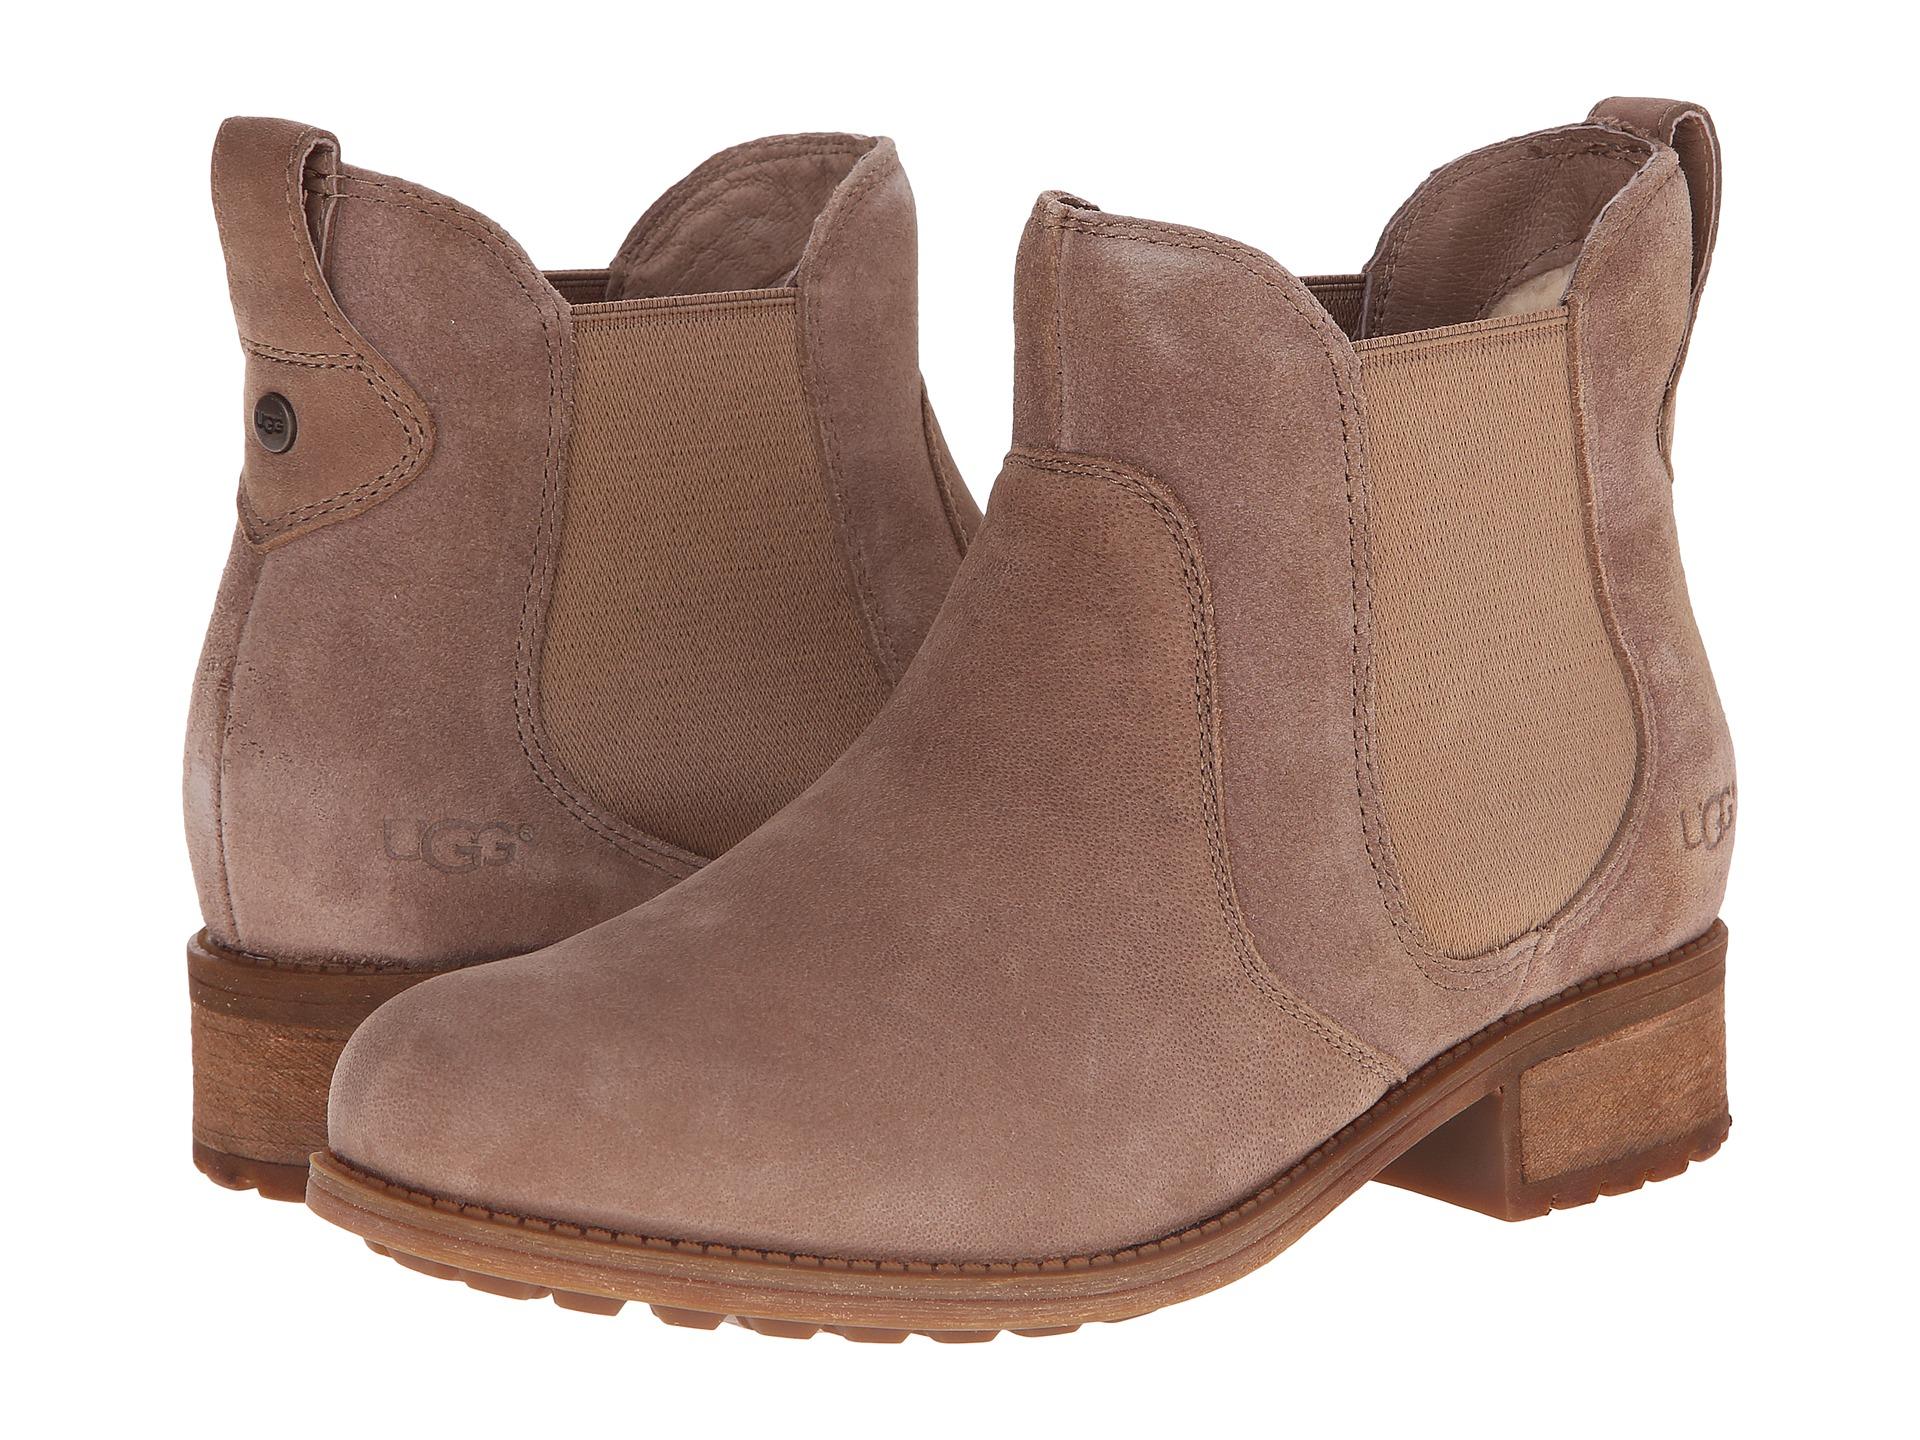 6390ee11821 Ugg Bonham Boots Size 6